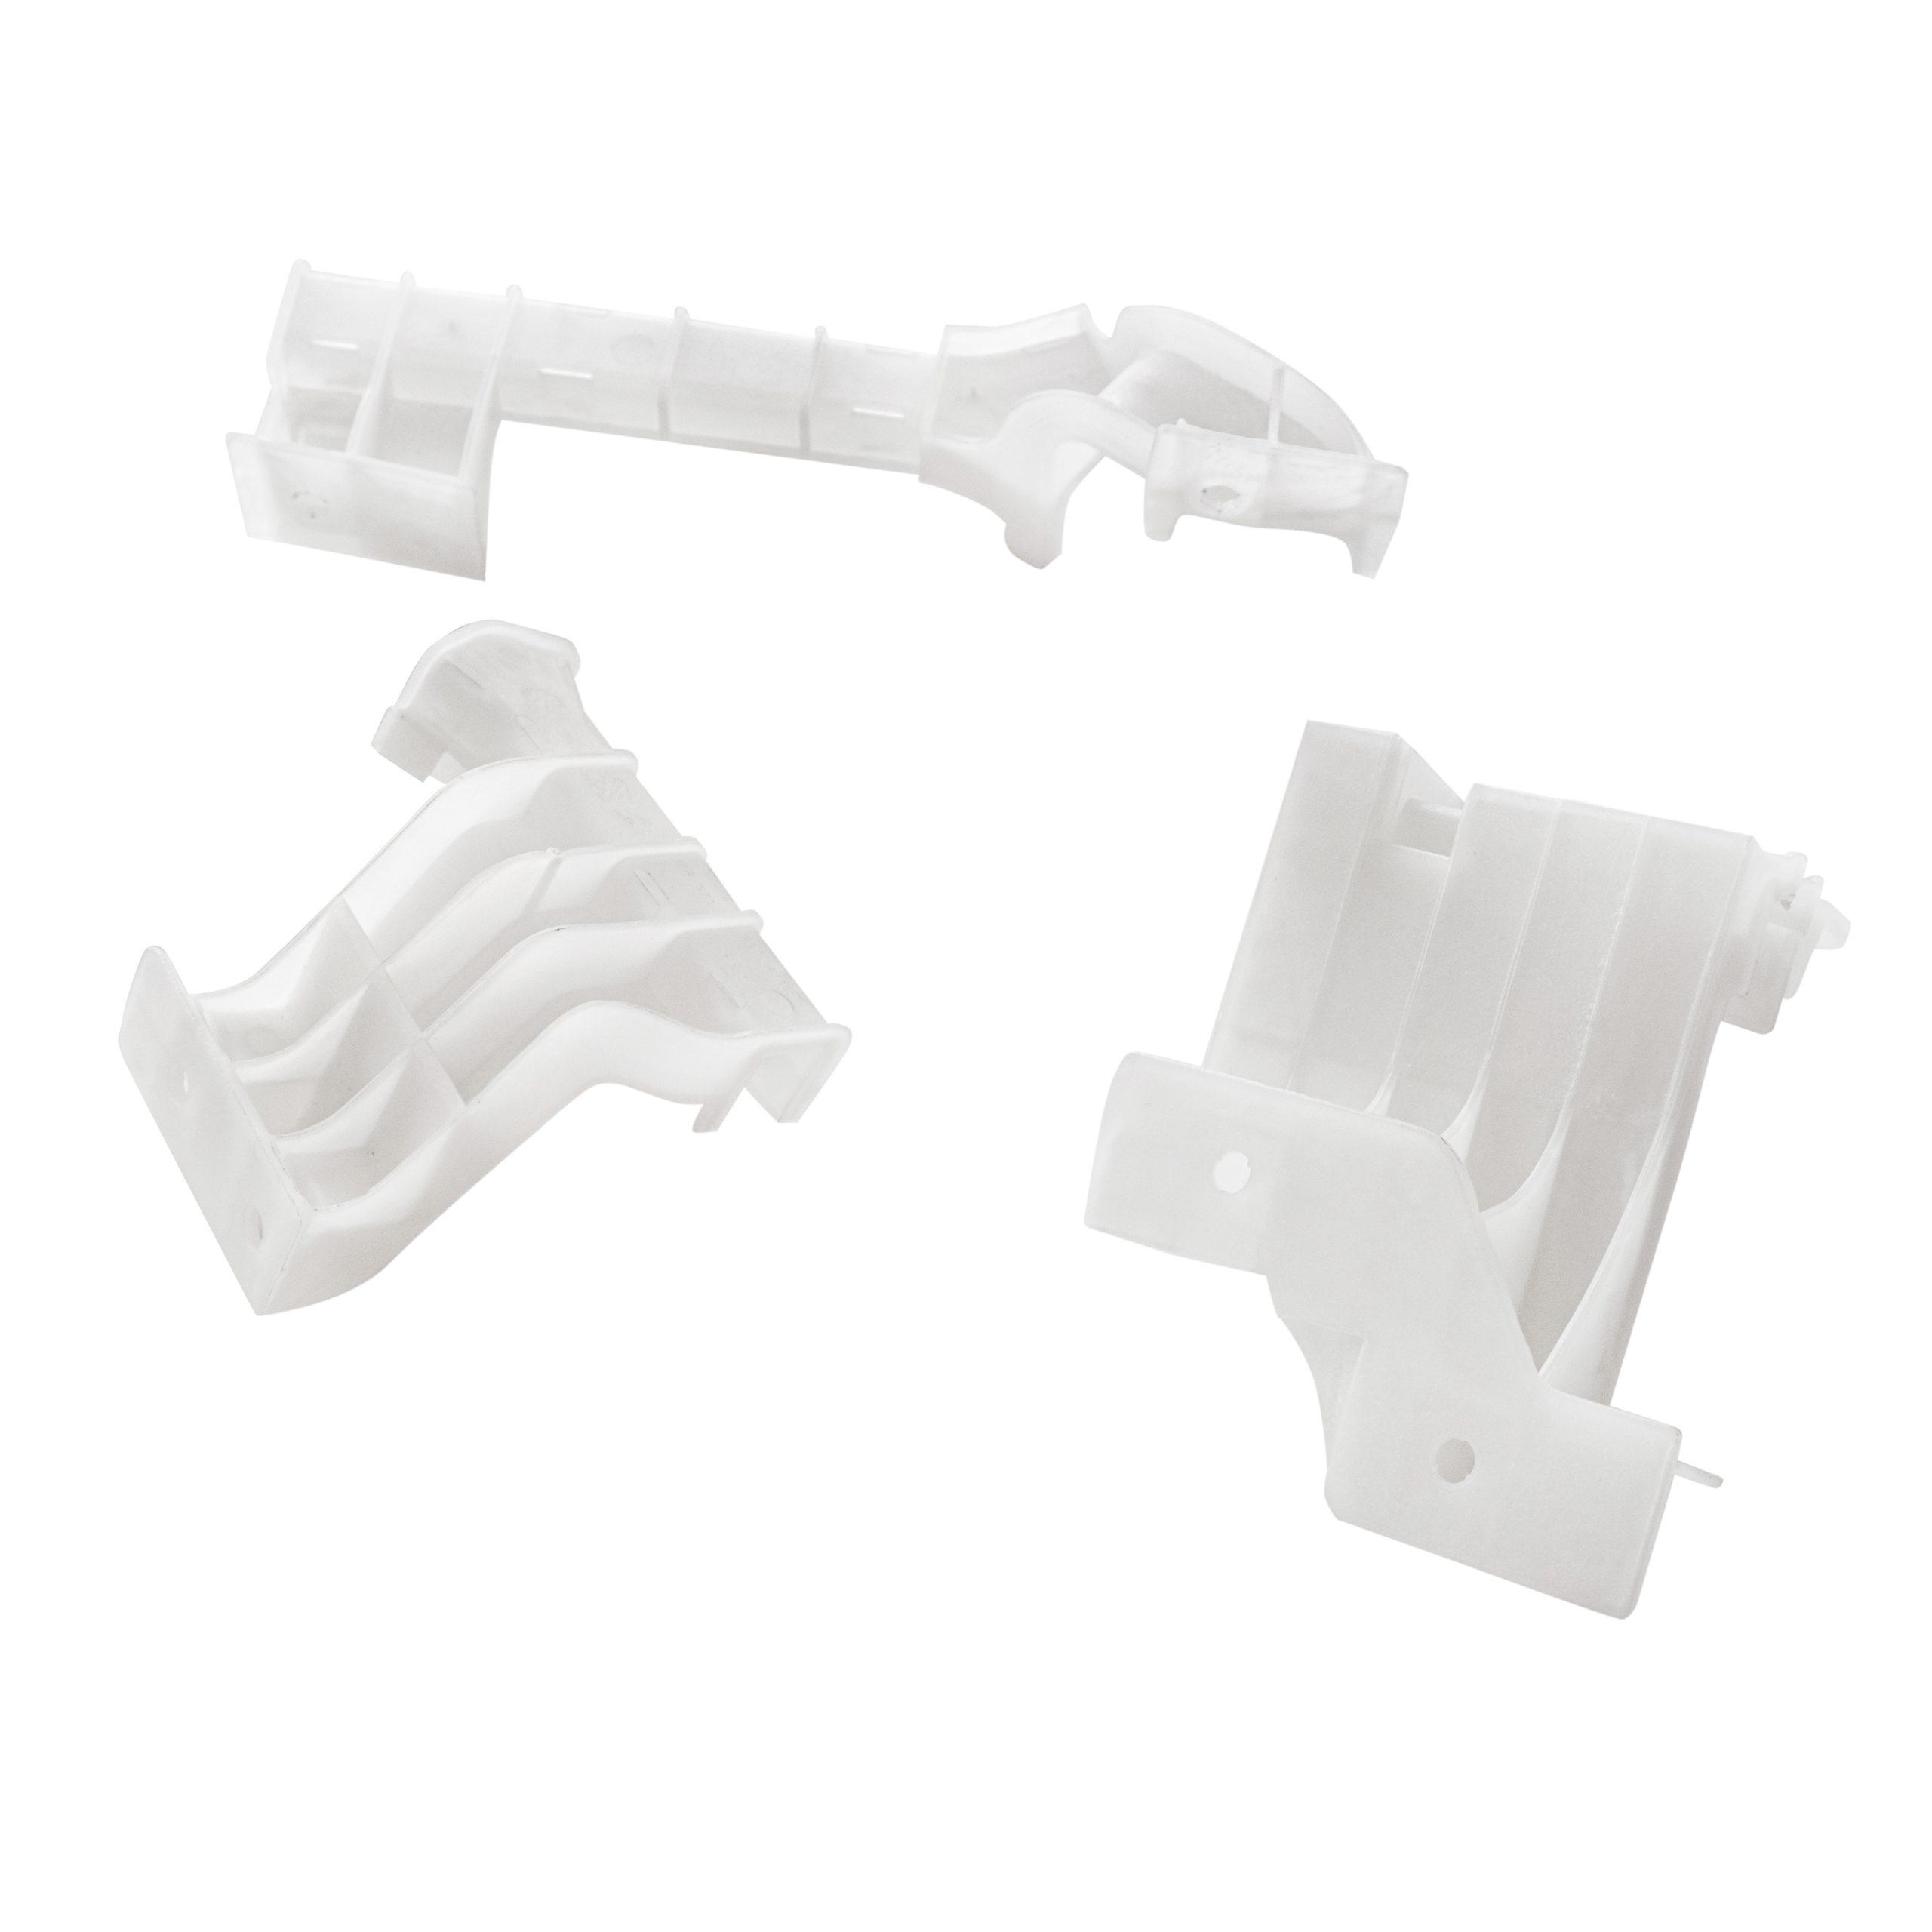 inovamolde-moldes-tecnicos-automovel-1